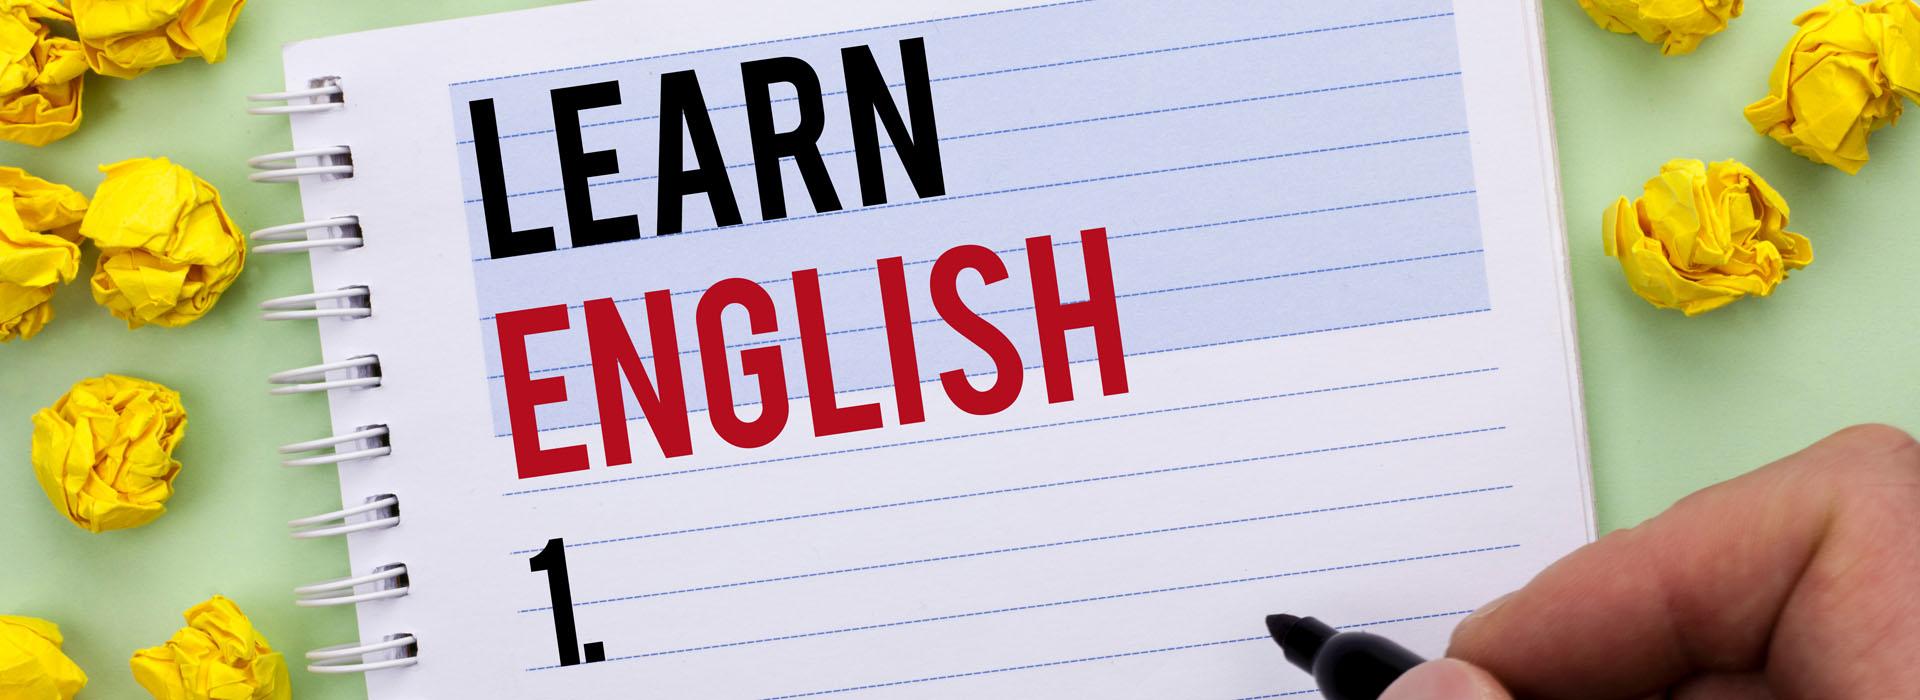 英文簡單學 – A LITTLE, SEVERAL, PLENTY OF 到底有多少 ?